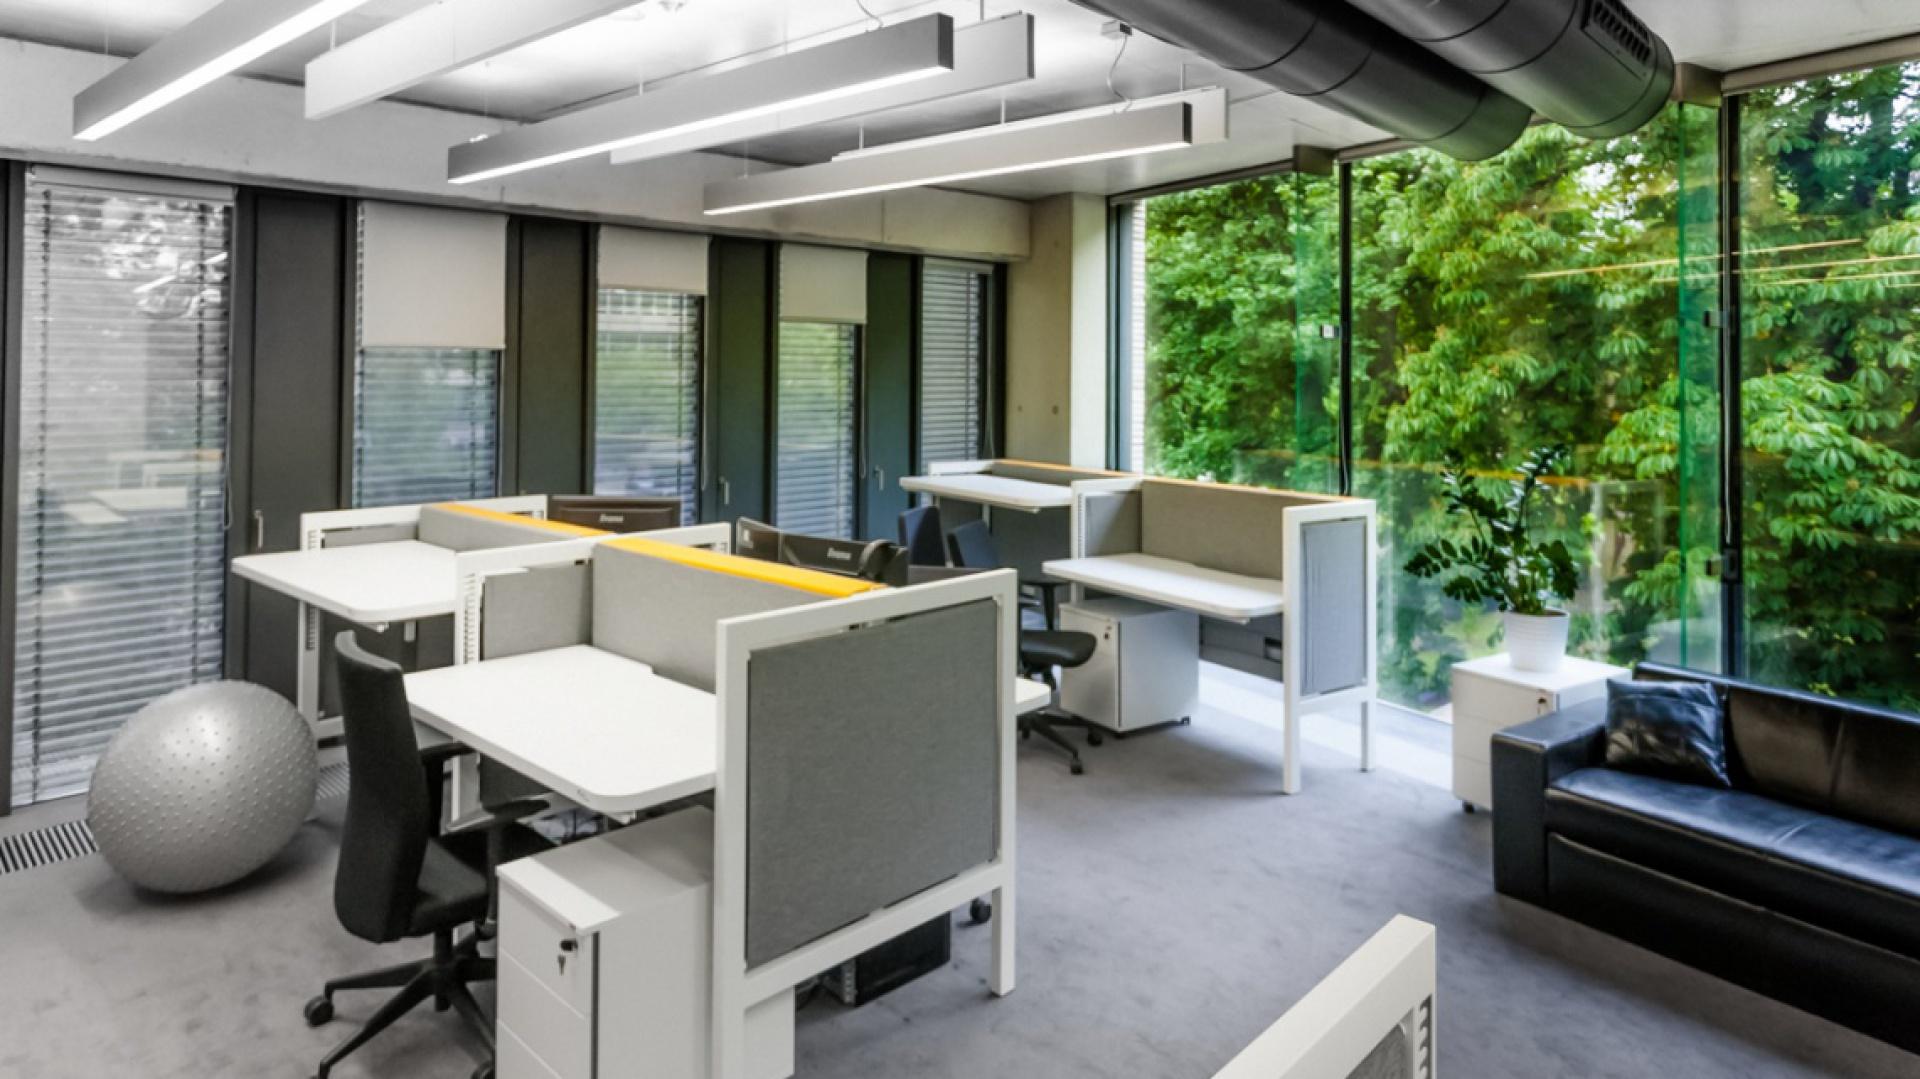 Fot. materiały prasowe Mikomax Smart Office